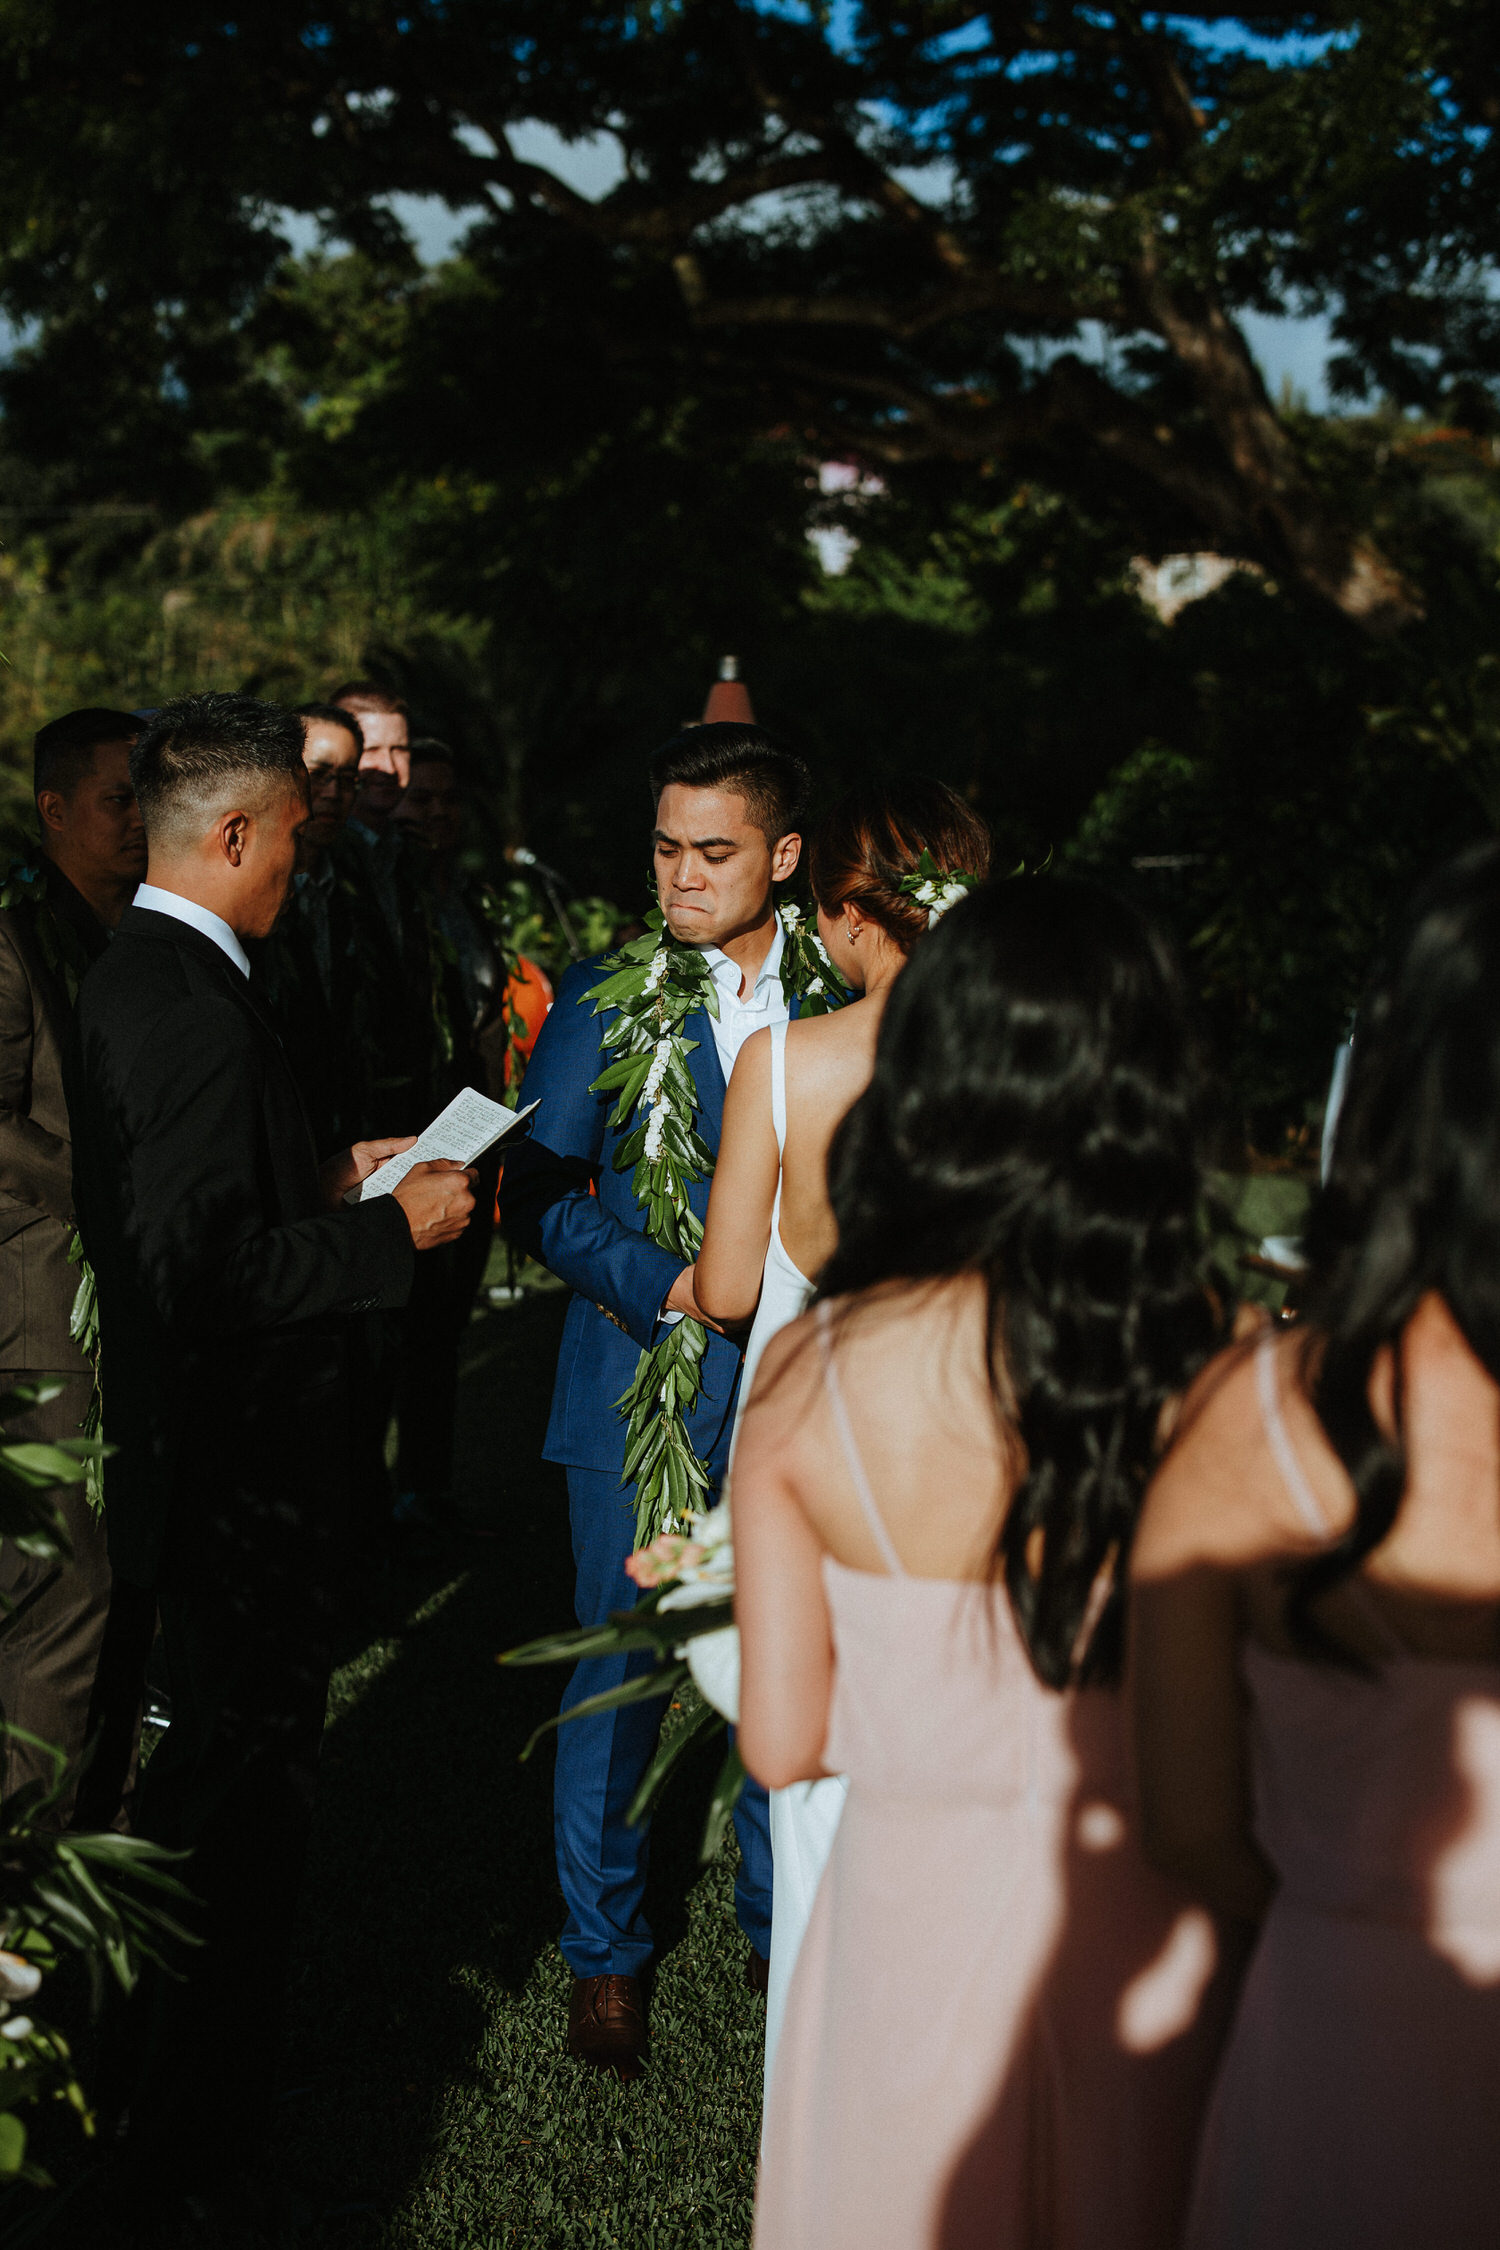 hawaii wedding ceremony, big island wedding ceremony, big island photographer, big island wedding photographer, kona photographer, kona wedding photographer, holualoa inn holualoa inn weddings, holuloa wedding photography, bliss n bloom weddings, bliss n blooms wedding planner, big island wedding planner